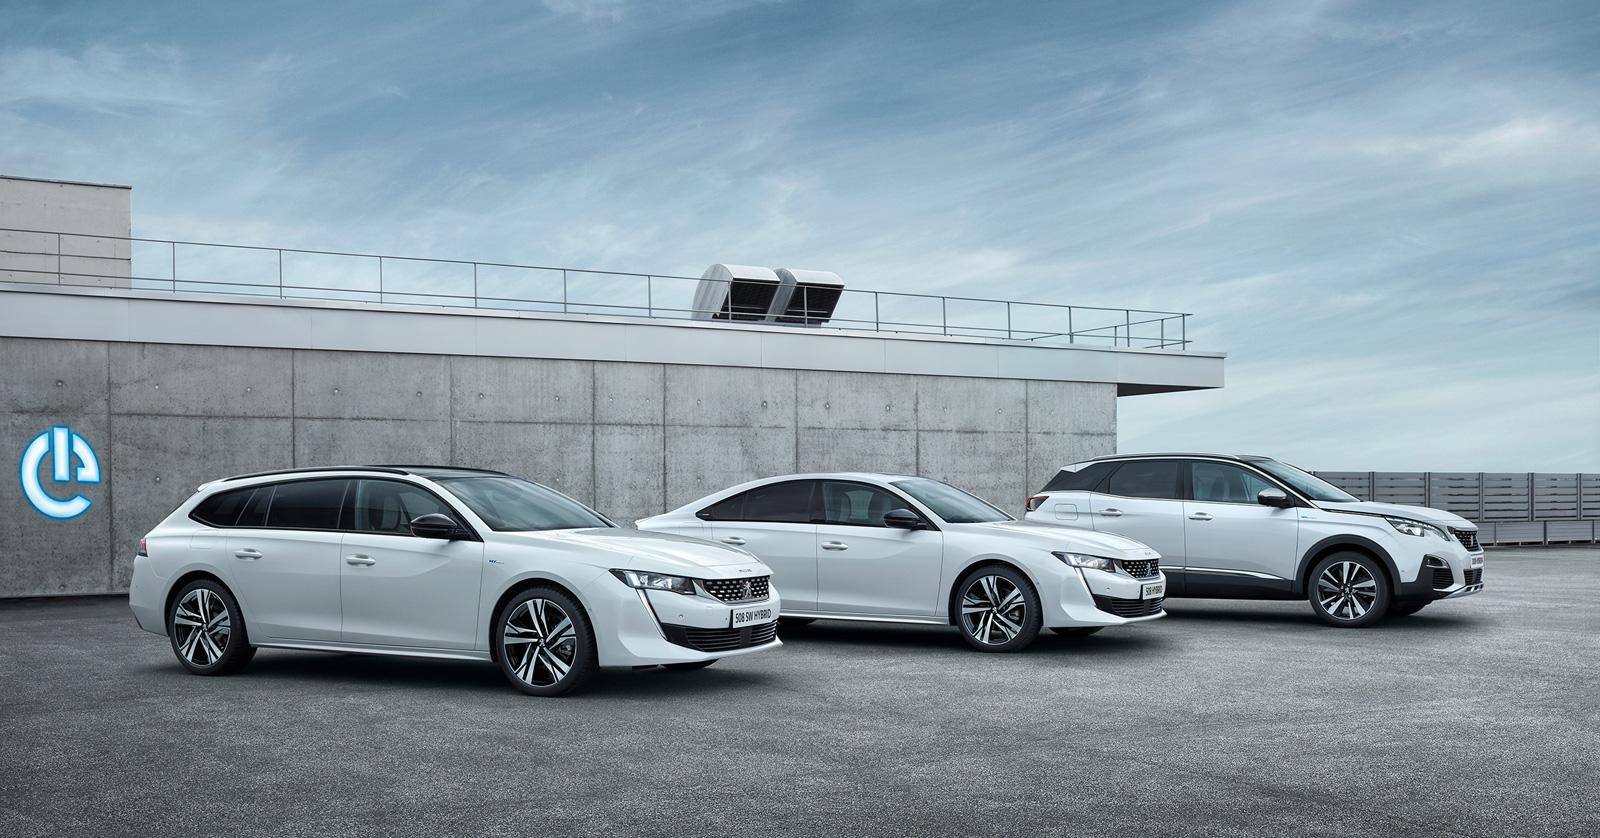 Disponibile din 2019: Peugeot 3008 și Peugeot 508 Plug-In Hybrid